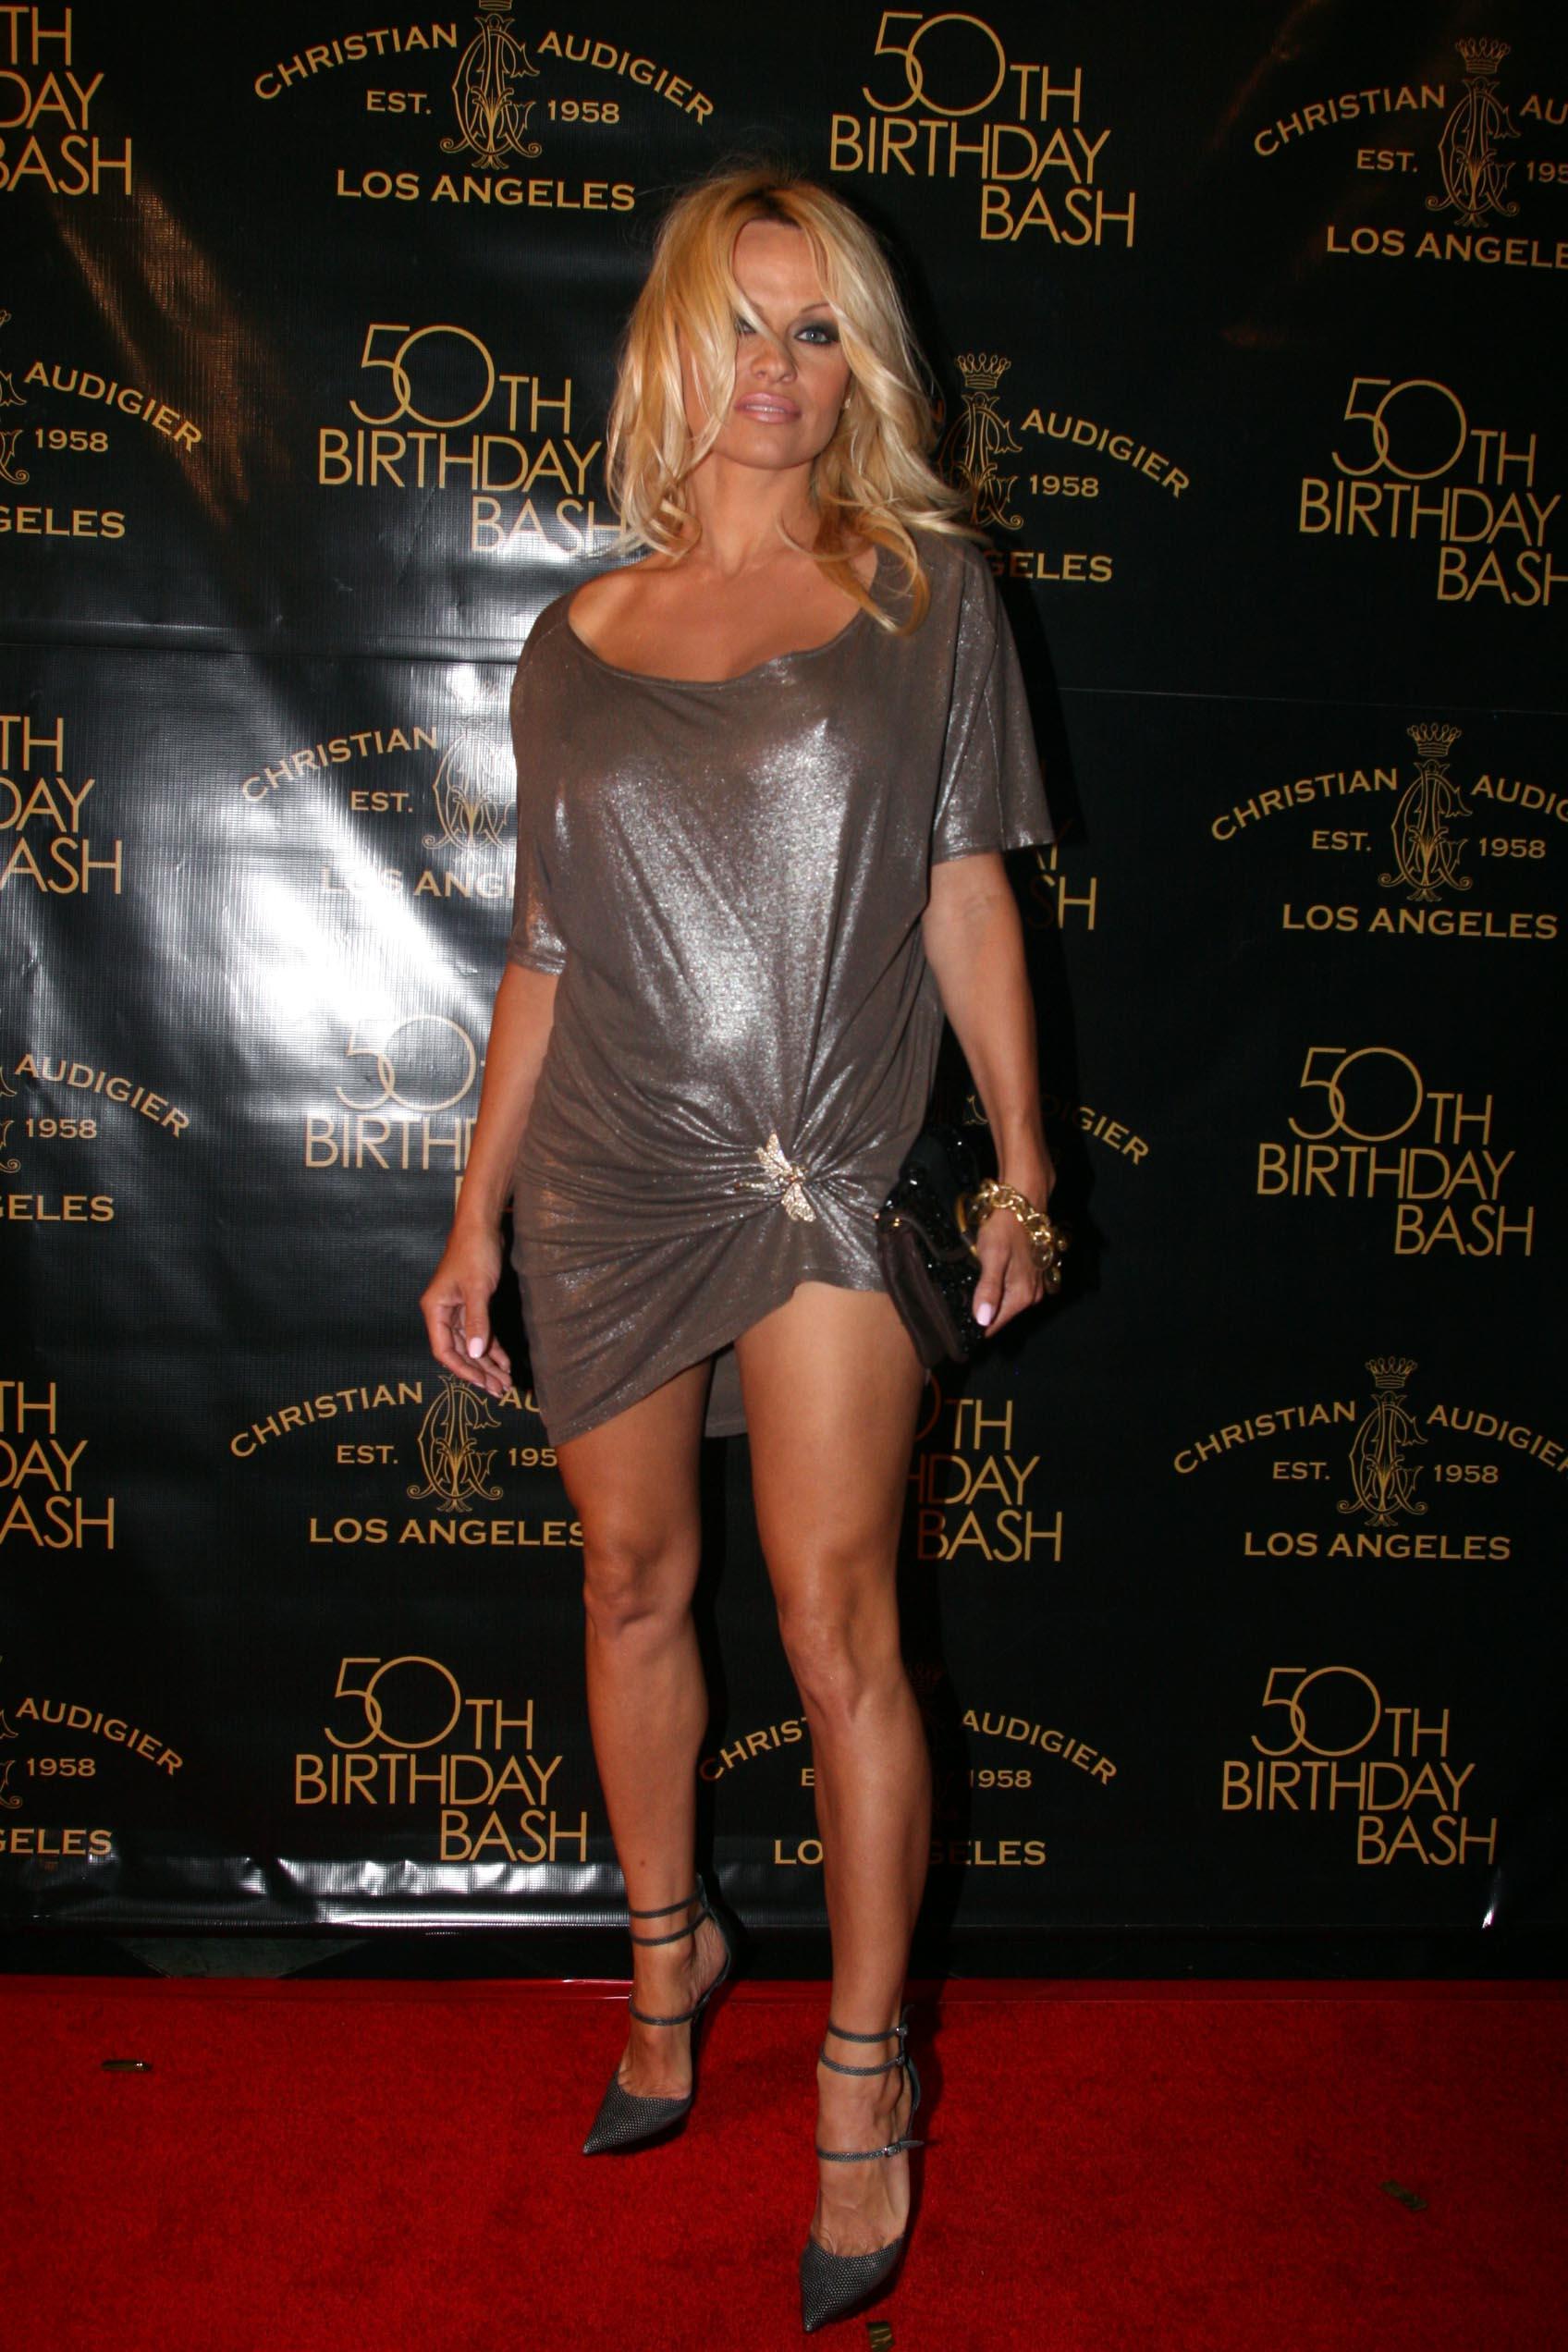 48913_Celebutopia-Pamela_Anderson-Designer_Christian_Audigier58s_50th_Birthday_Bash-03_122_512lo.jpg